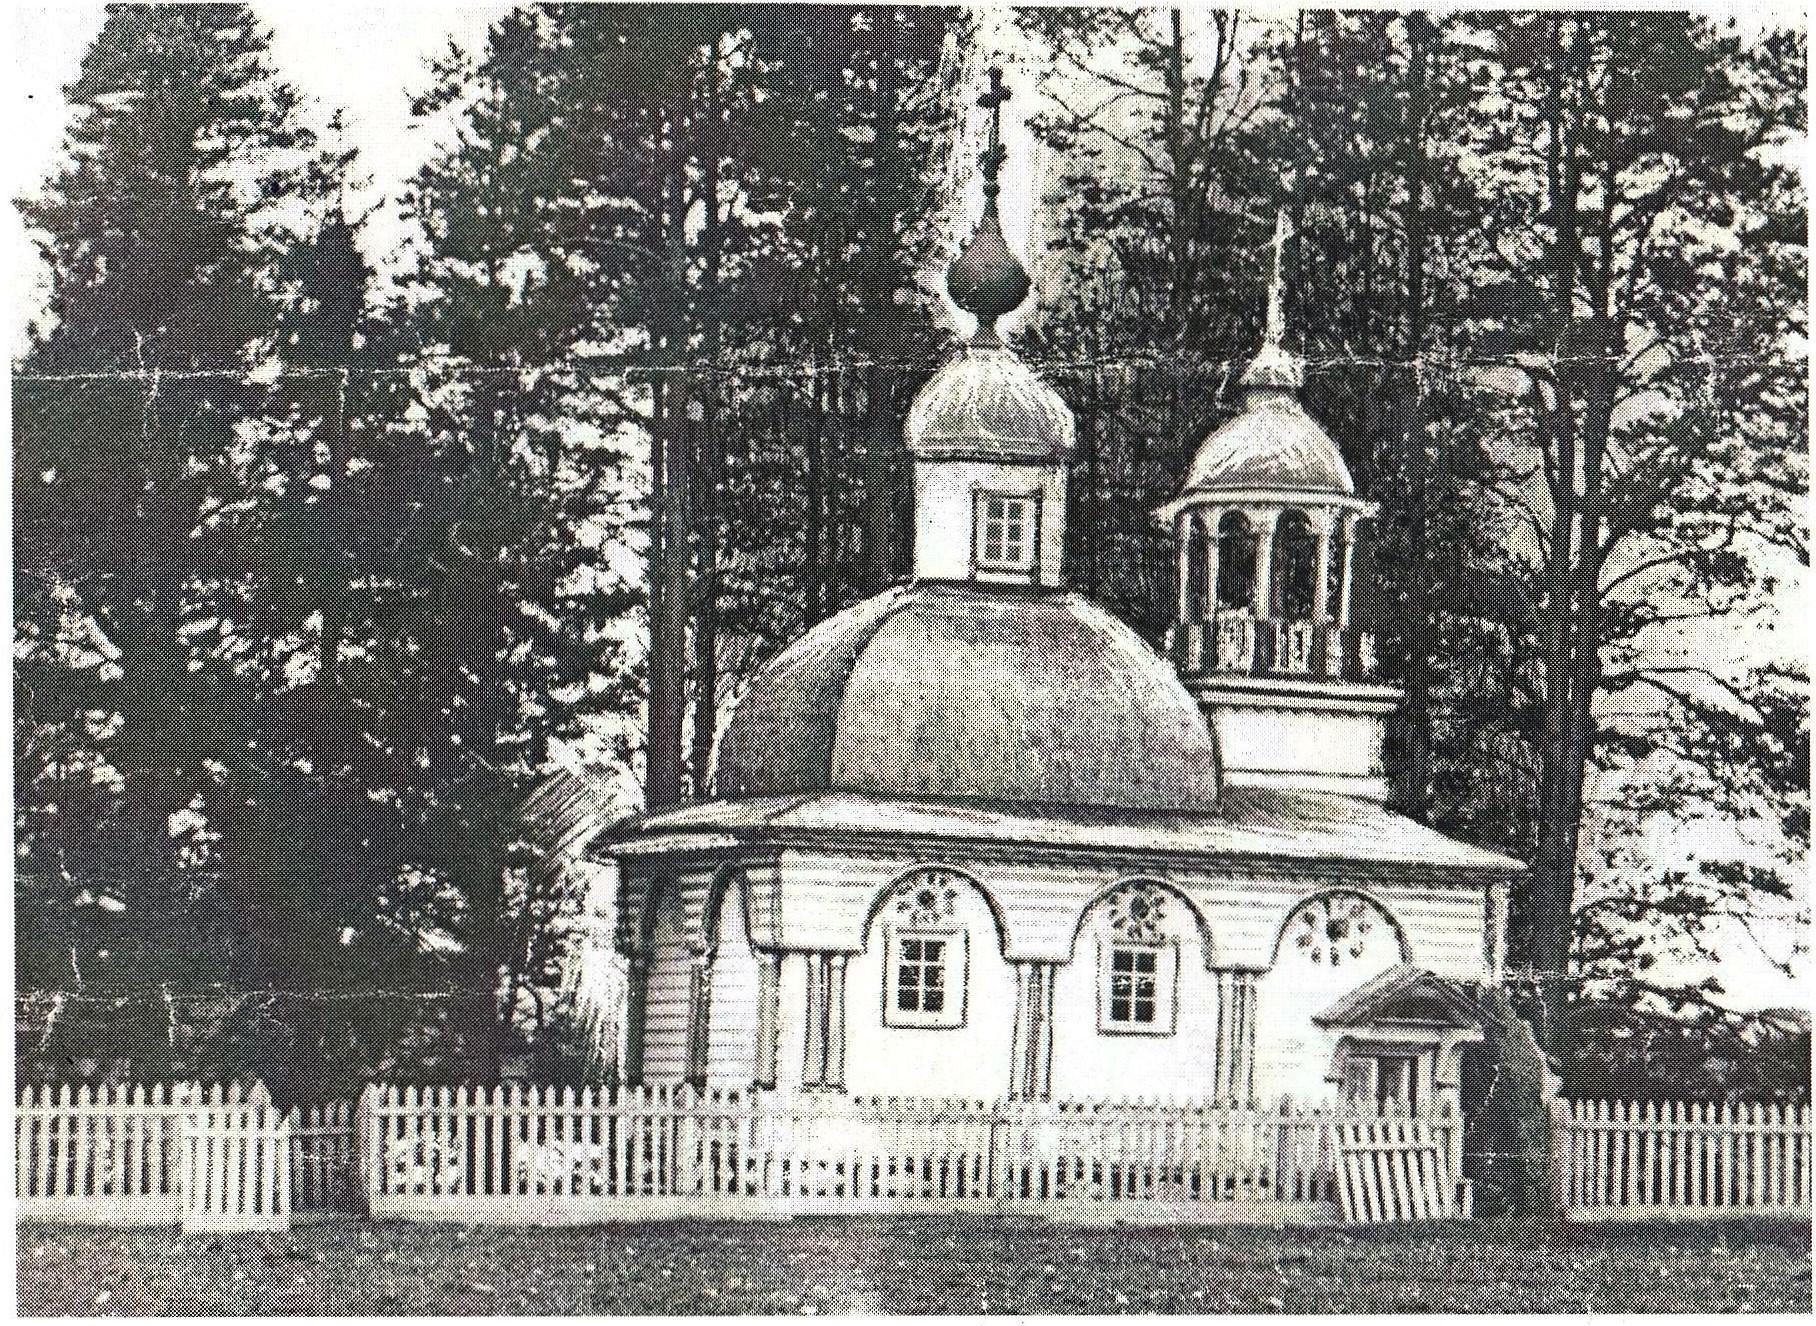 Воздвиженская часовня в деревне Заважерец Коношского района